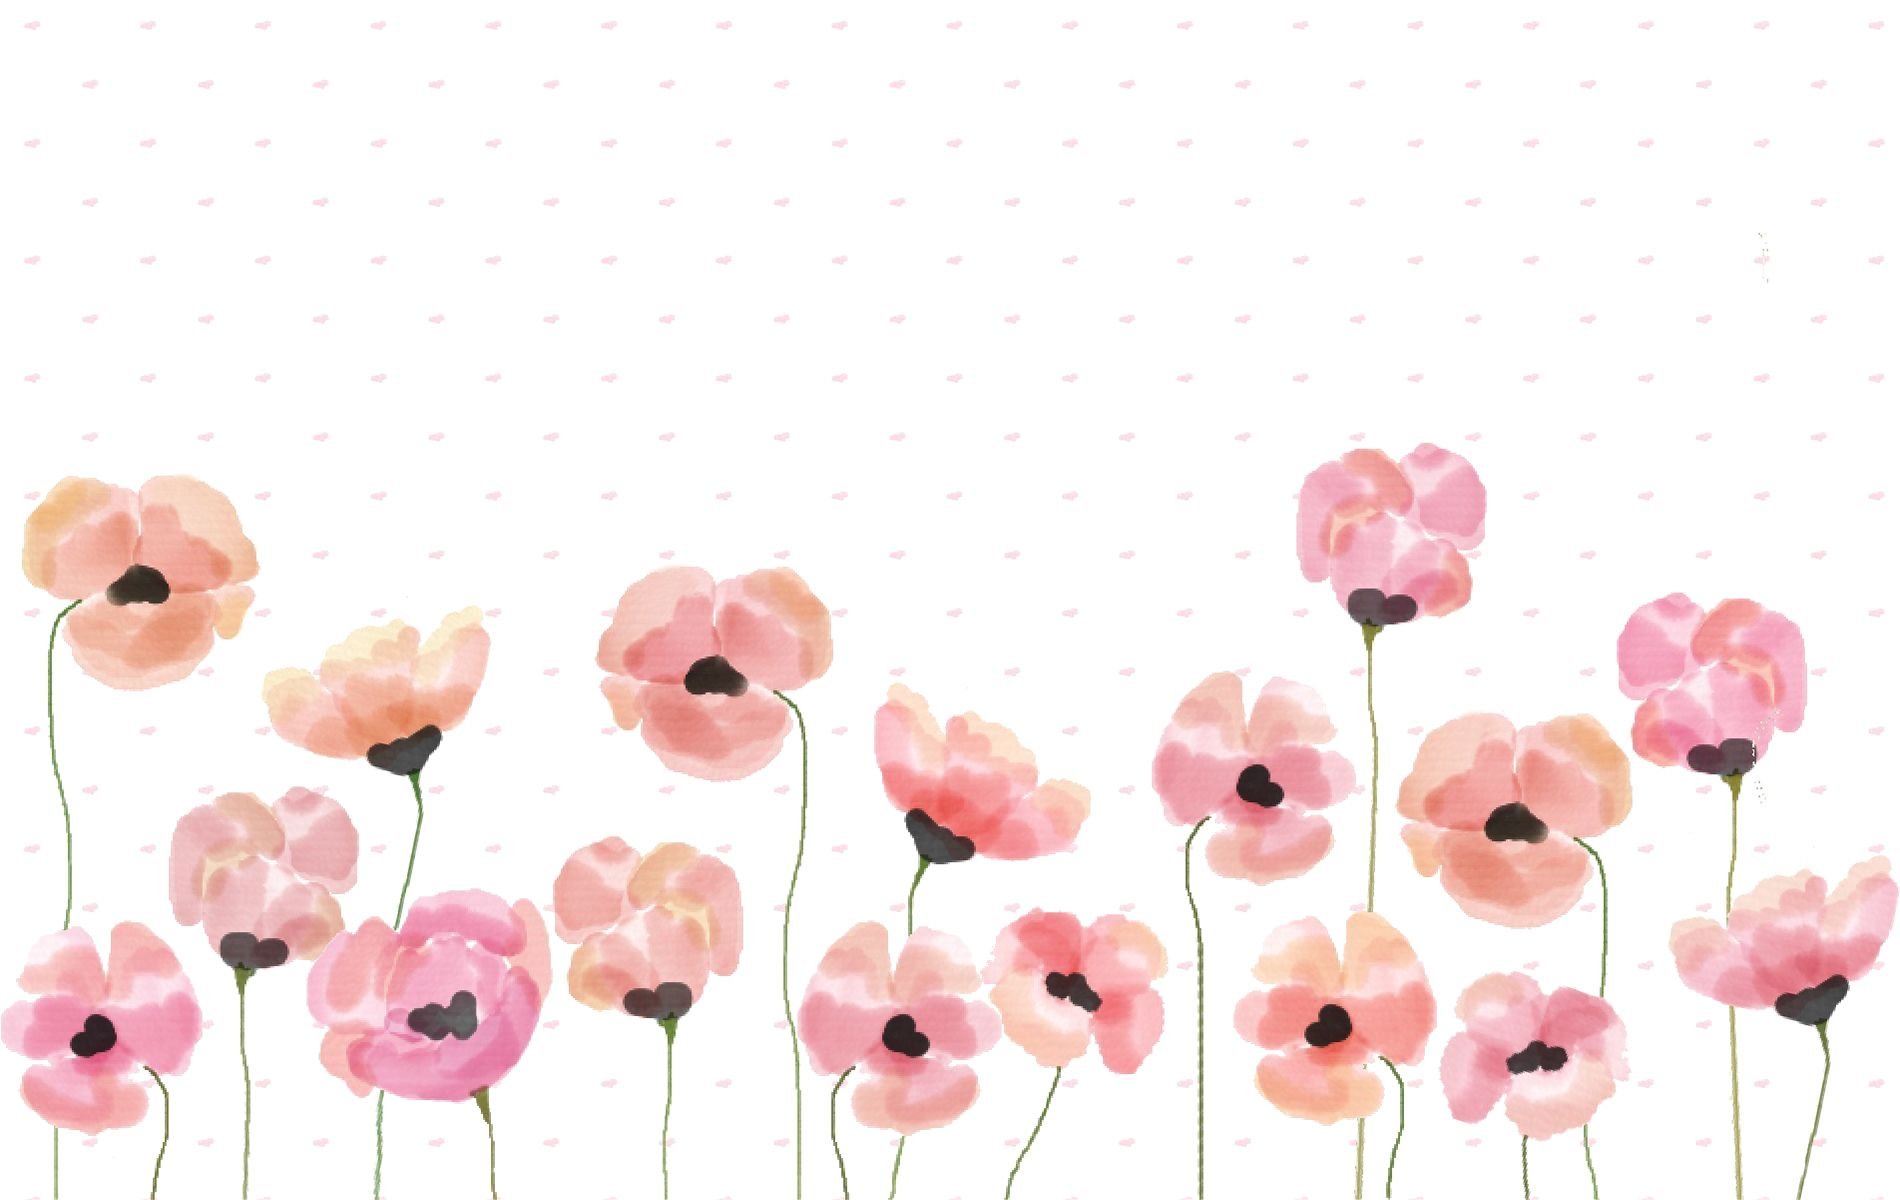 Poppies Desktop Wallpapers Background Wallpapers Pinterest Con Fondos De Pantalla Par En 2020 Con Imagenes Disenos Del Fondo De Pantalla Fondos Para Pc Tumblr Fondo De Pantalla Mac